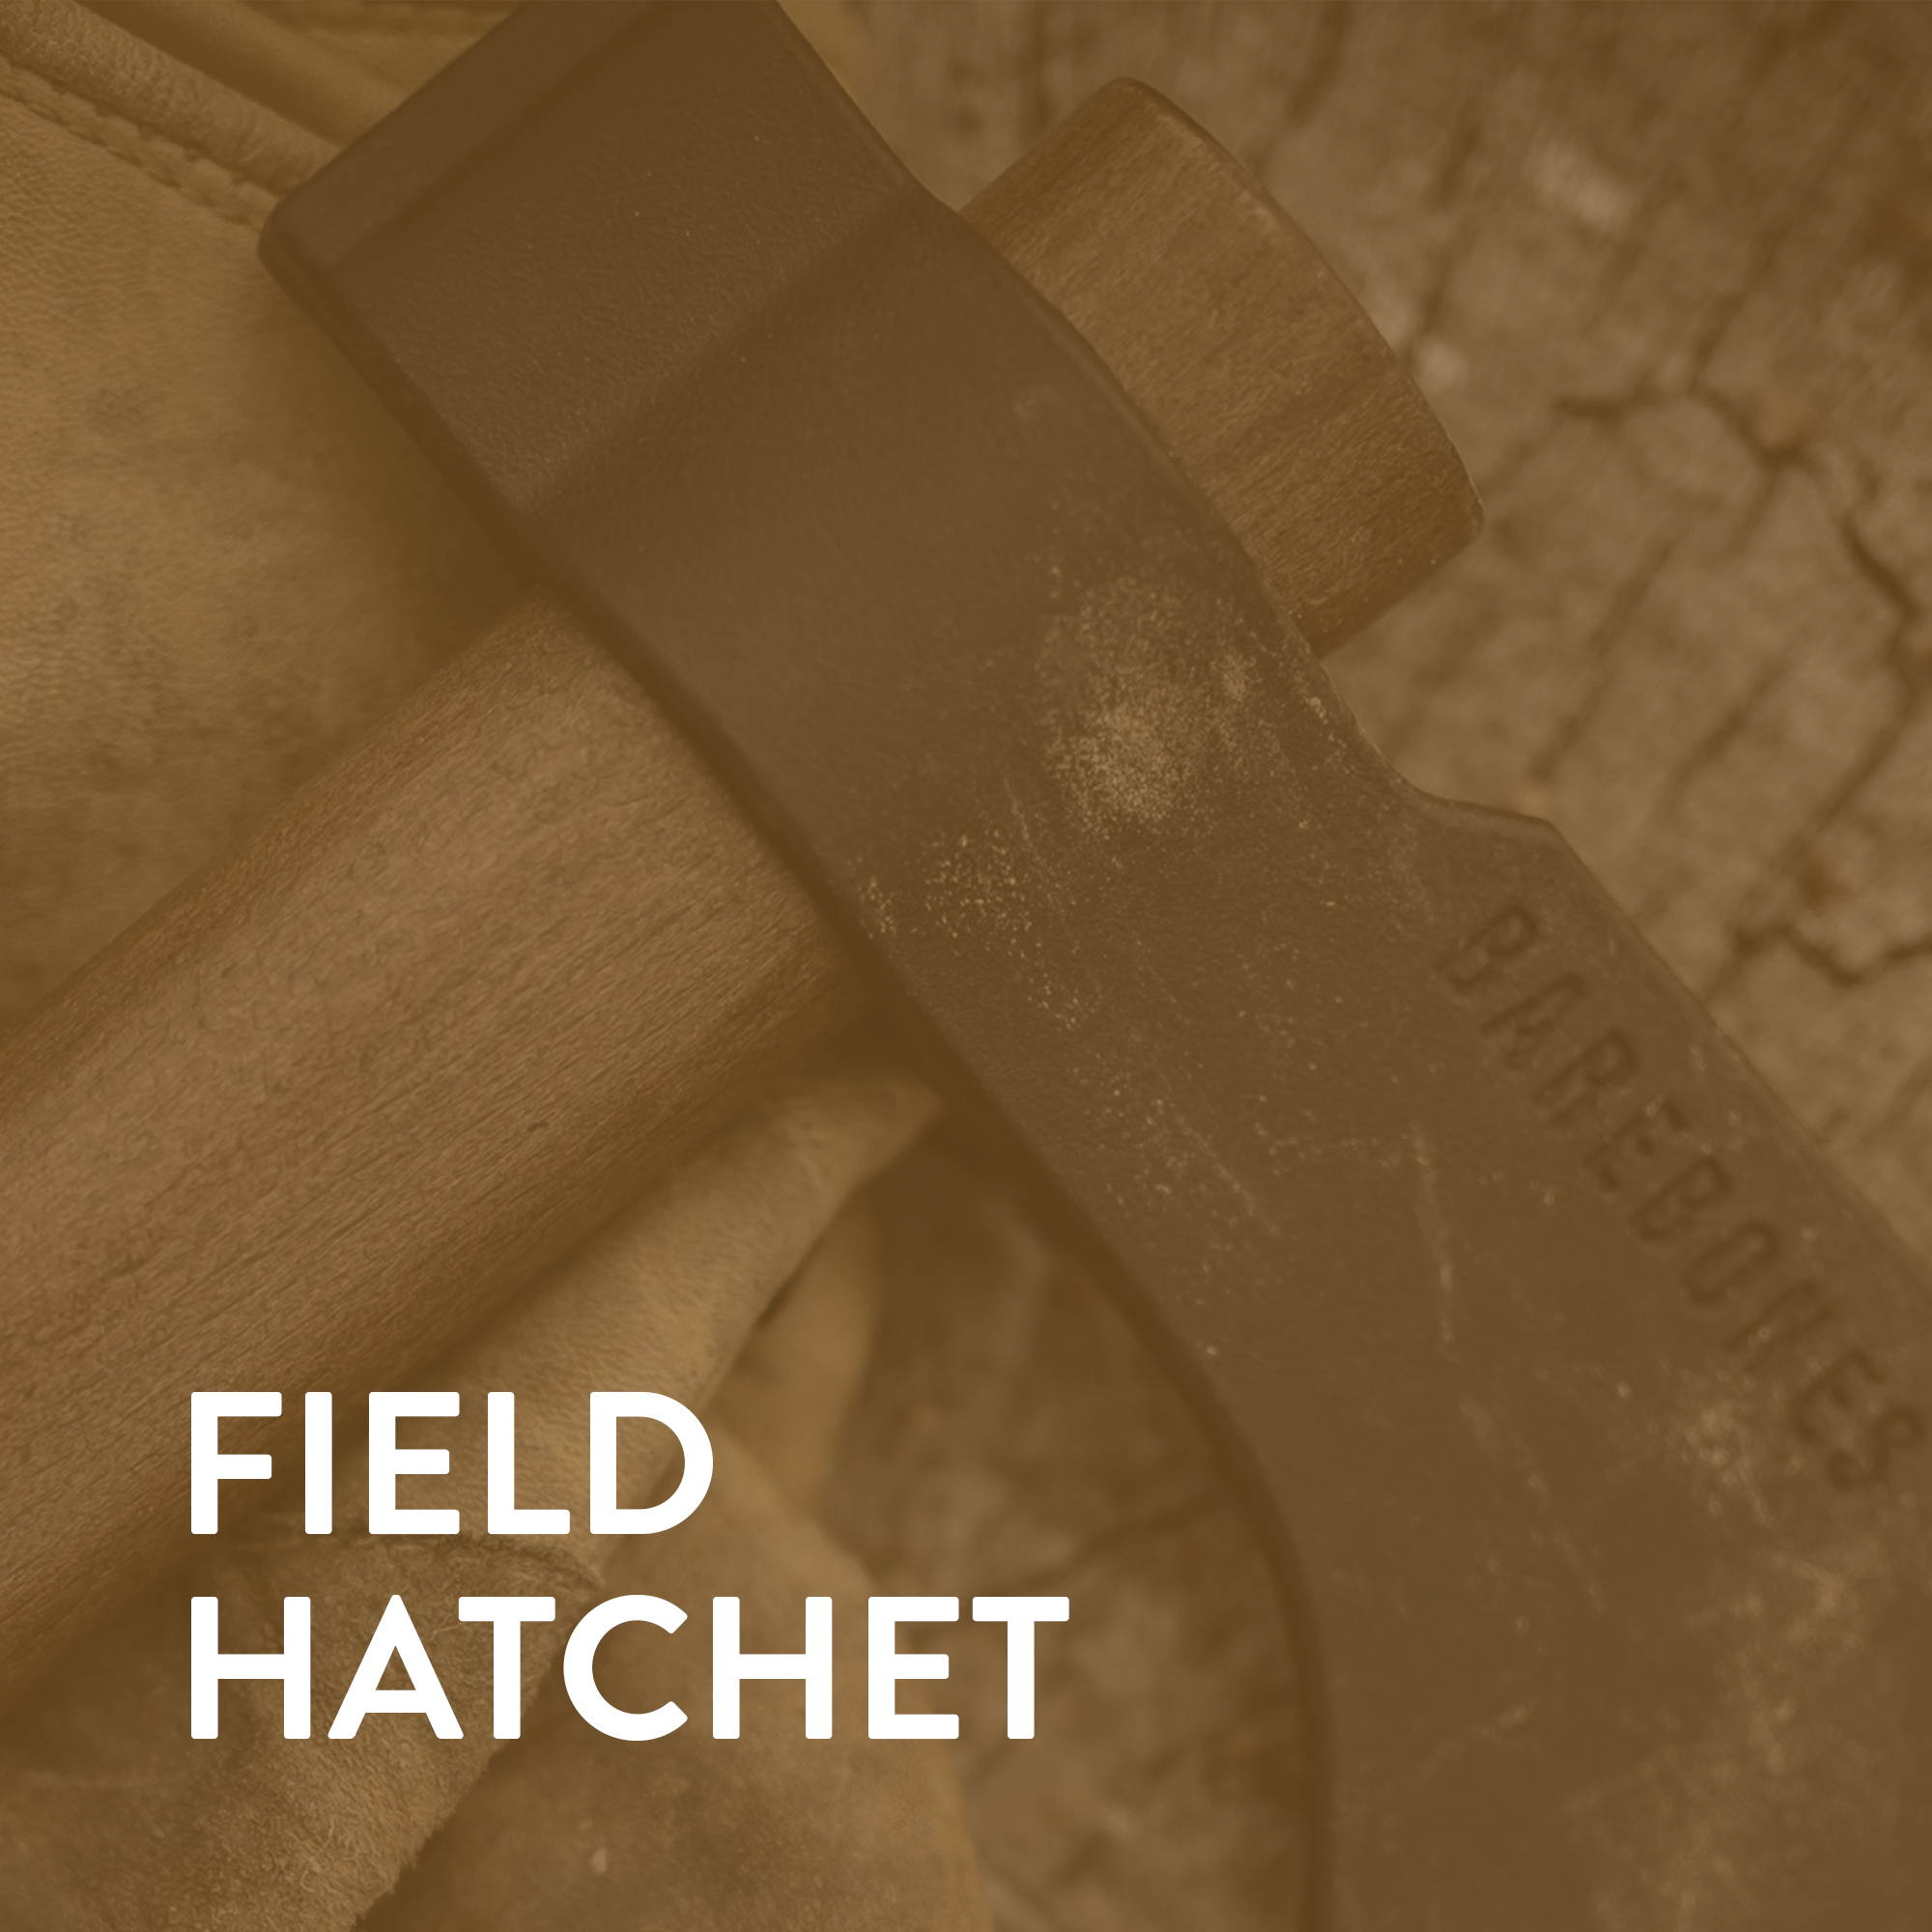 Field Hatchet